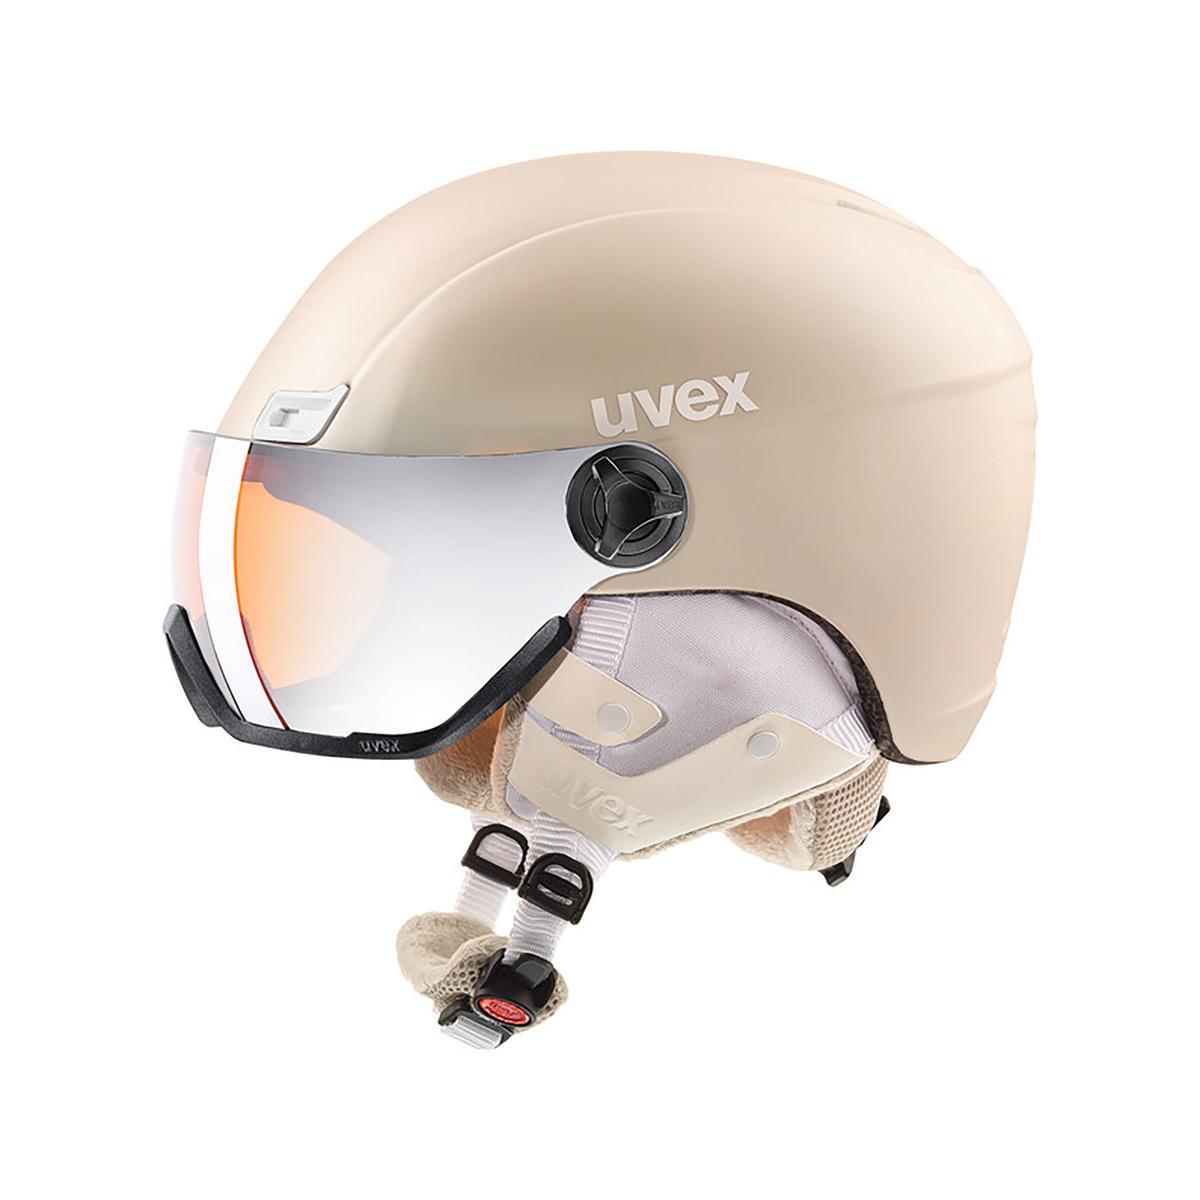 CASCO UVEX 400 VISOR STYLE DONNA